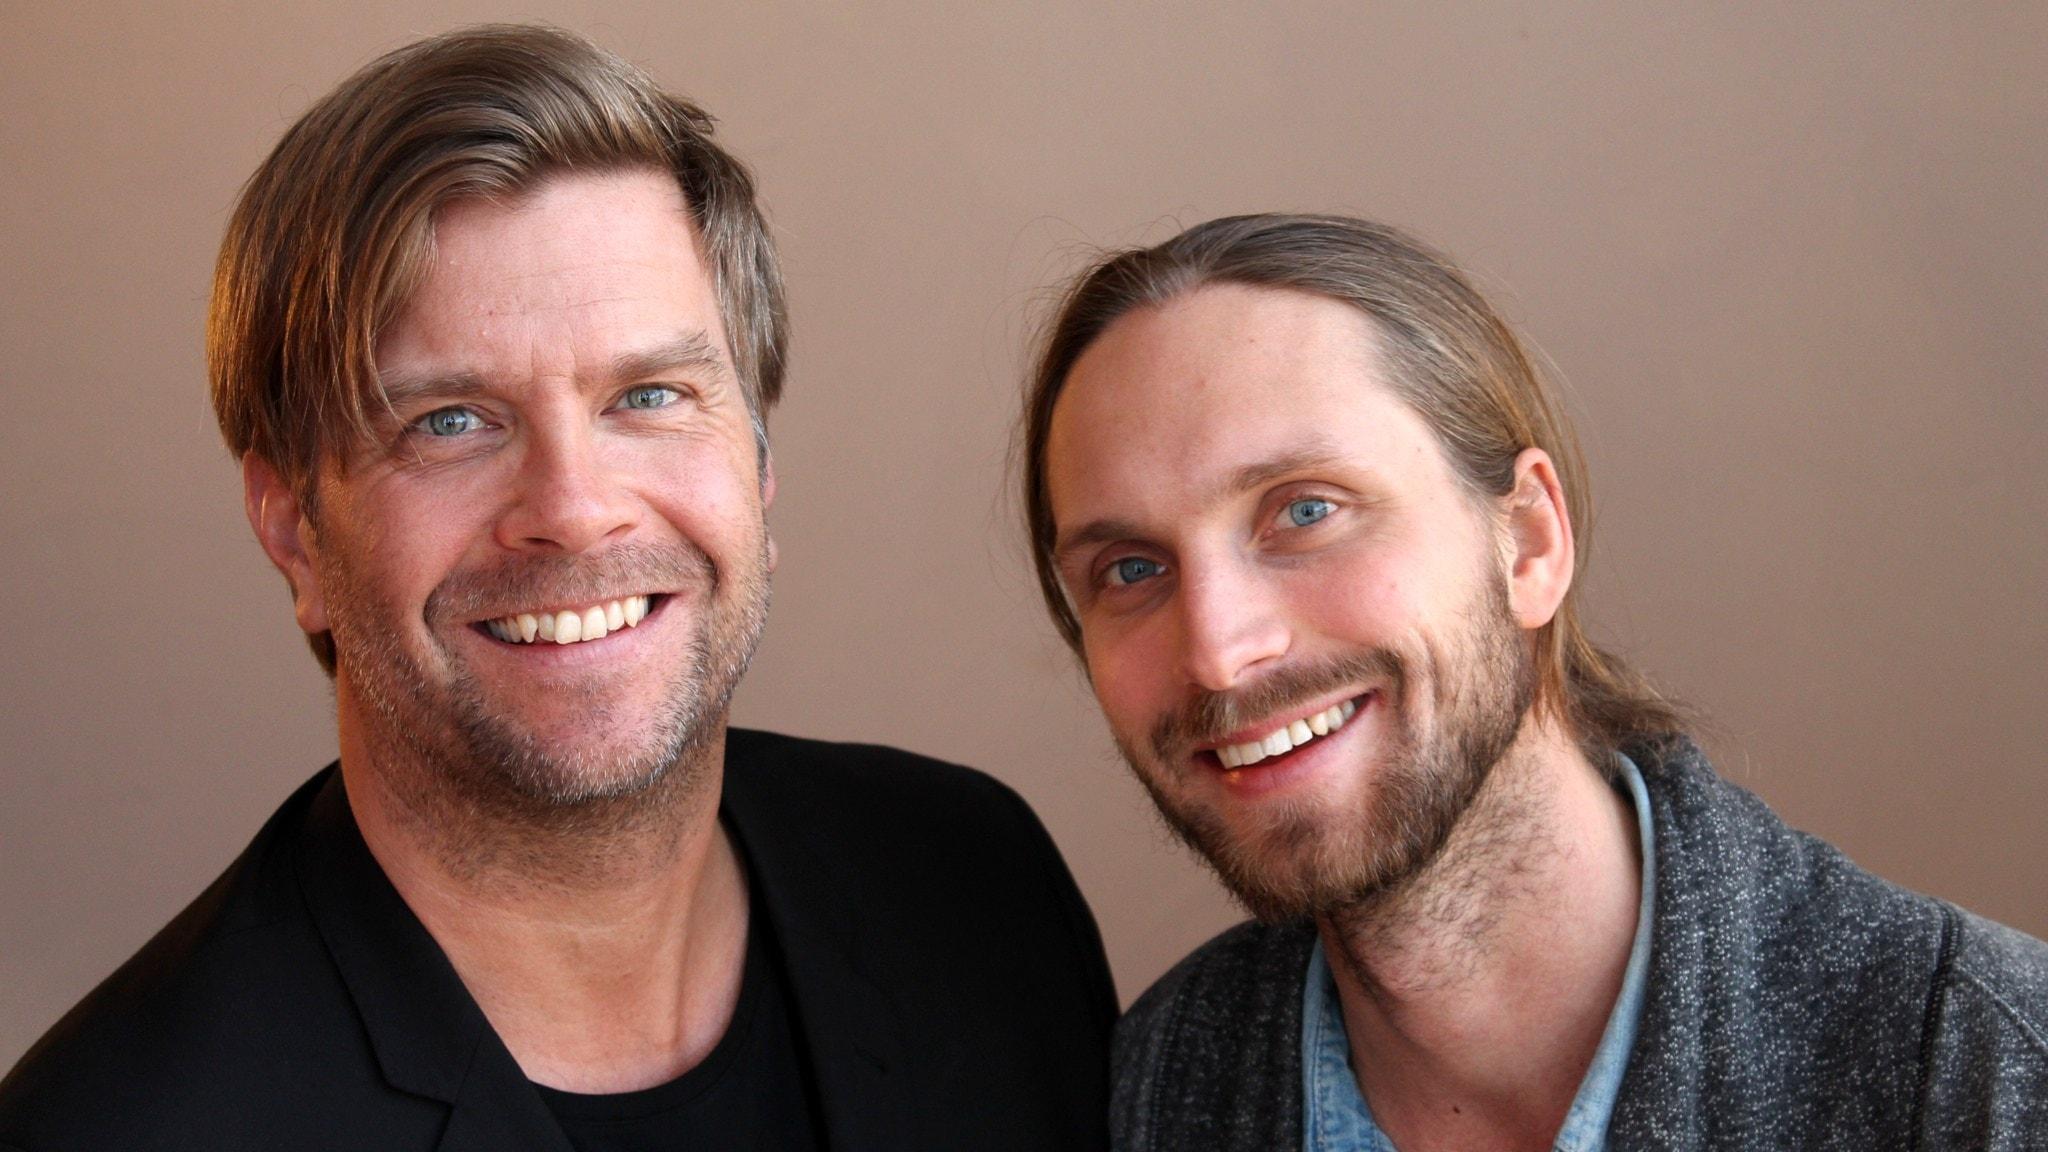 Med Bosse Pettersson